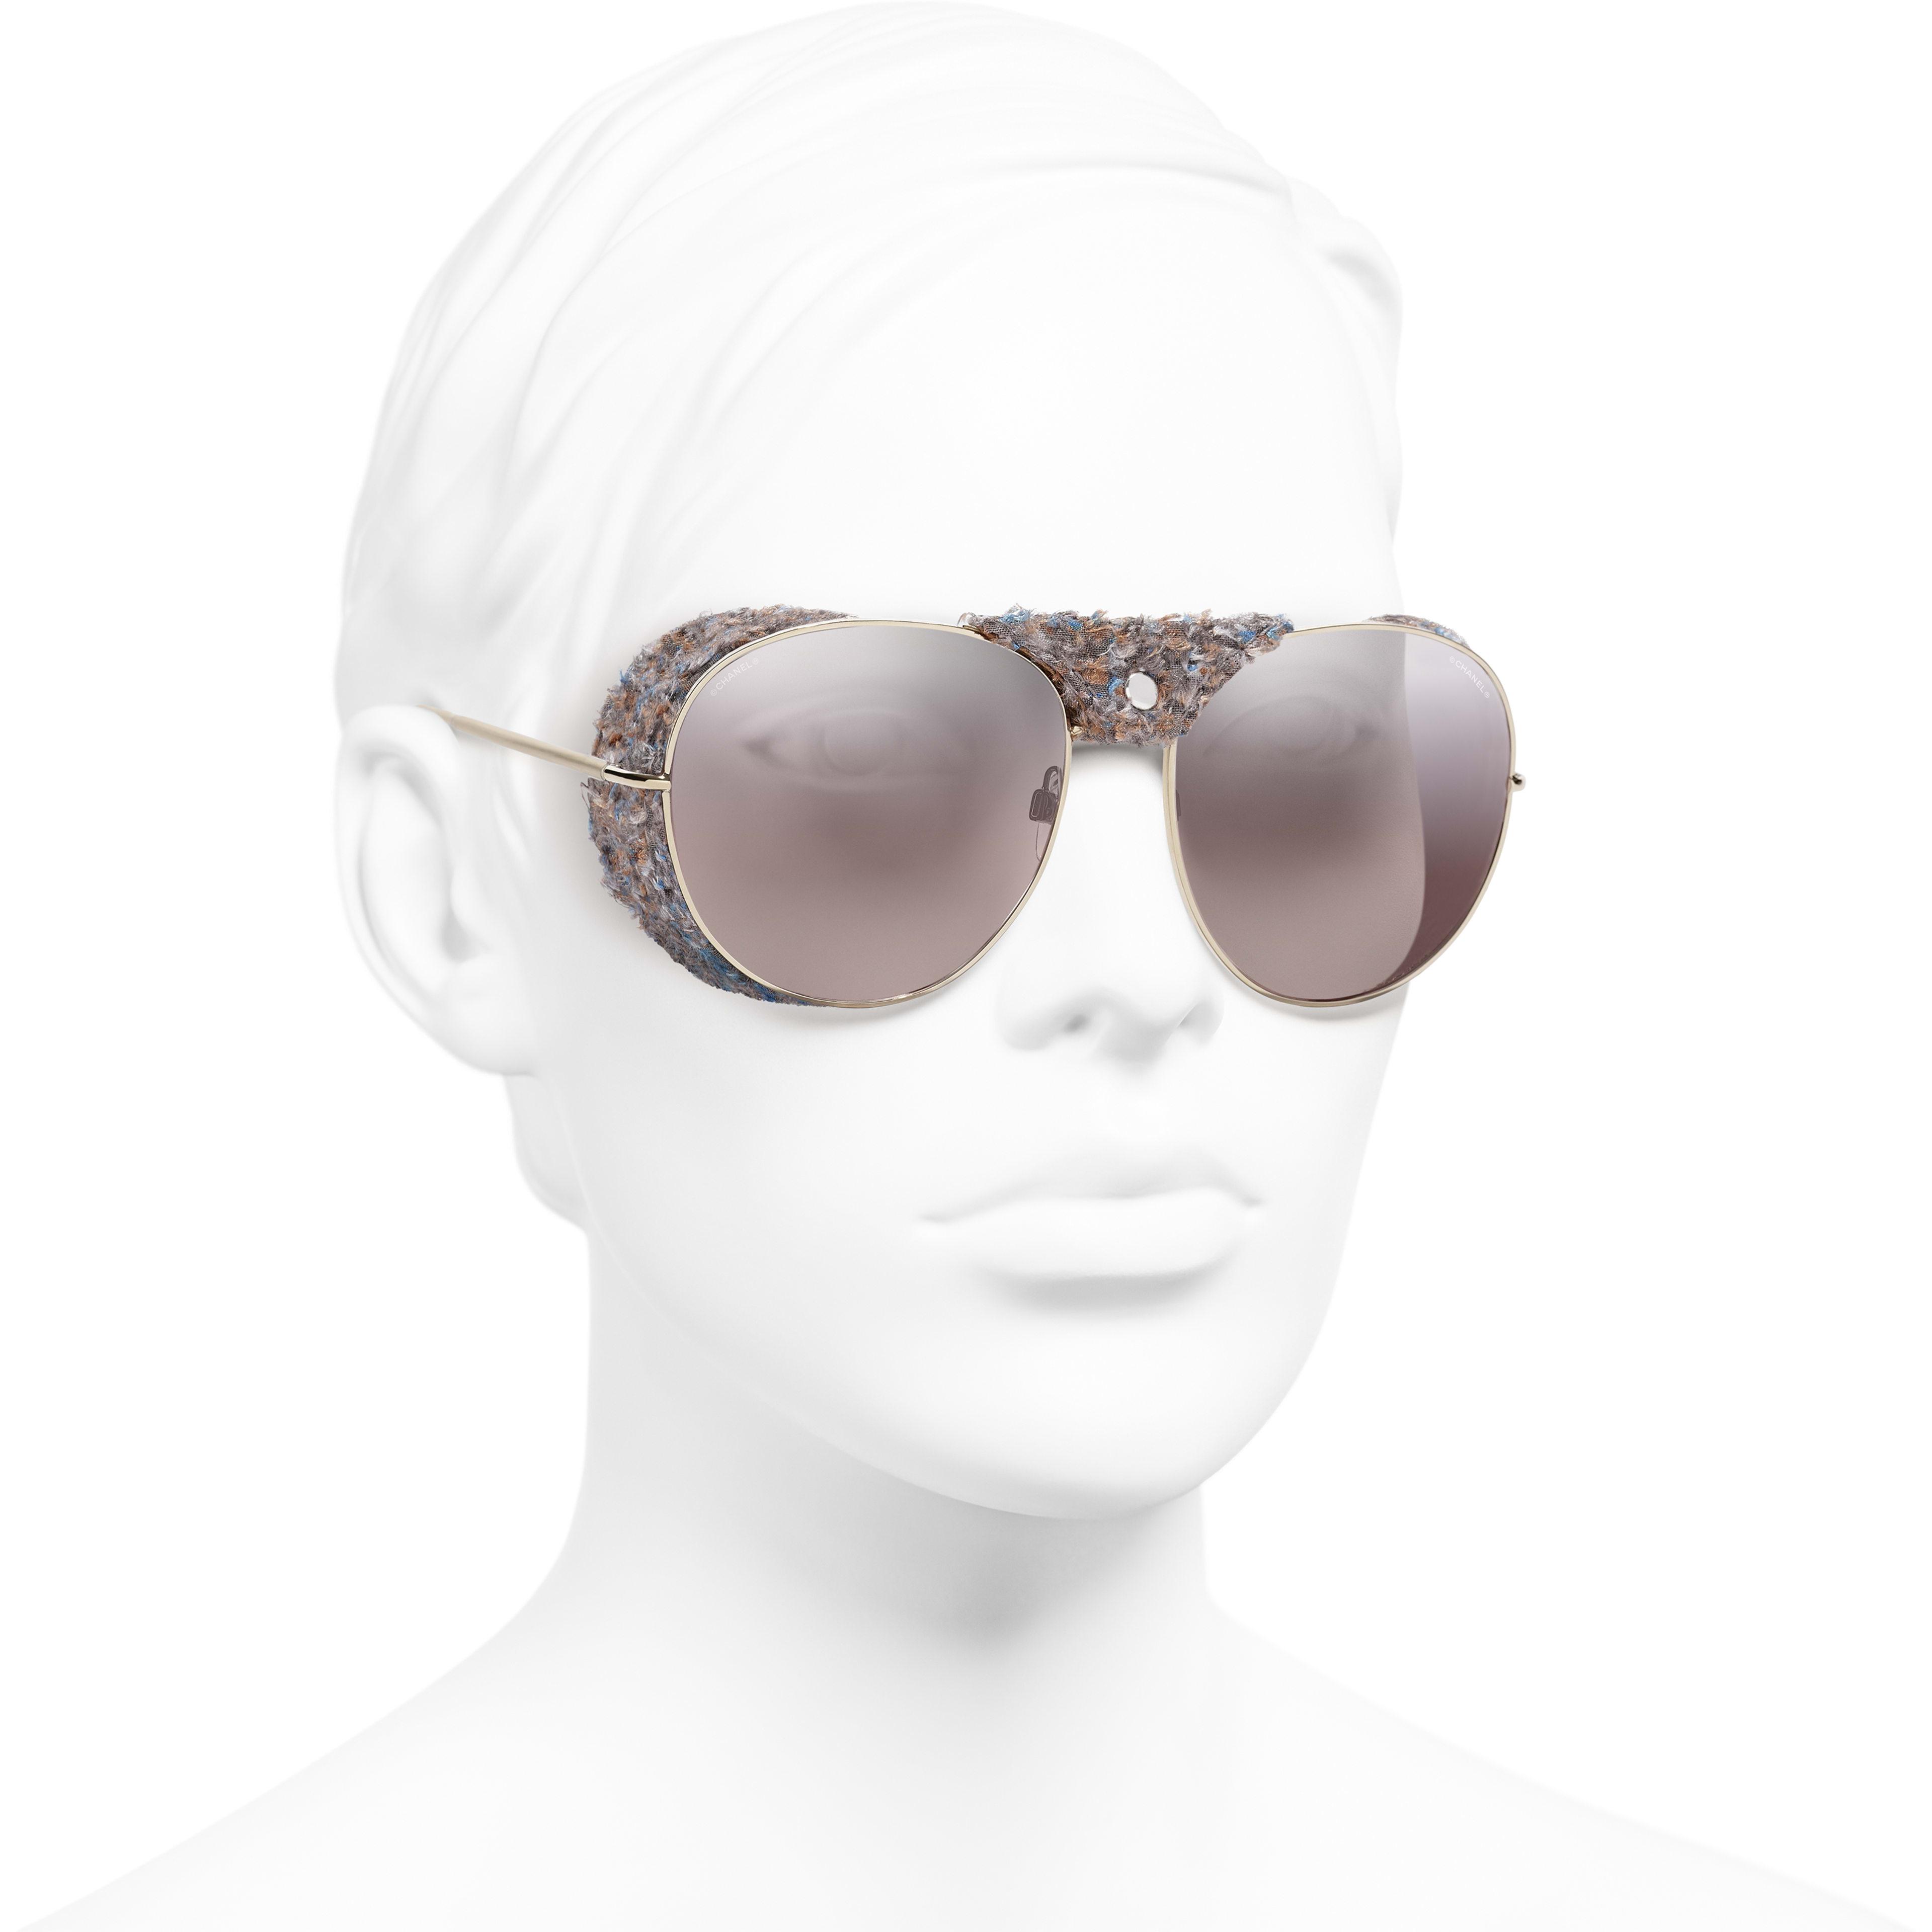 65a4f3d87c ... Pilot Sunglasses - Gold